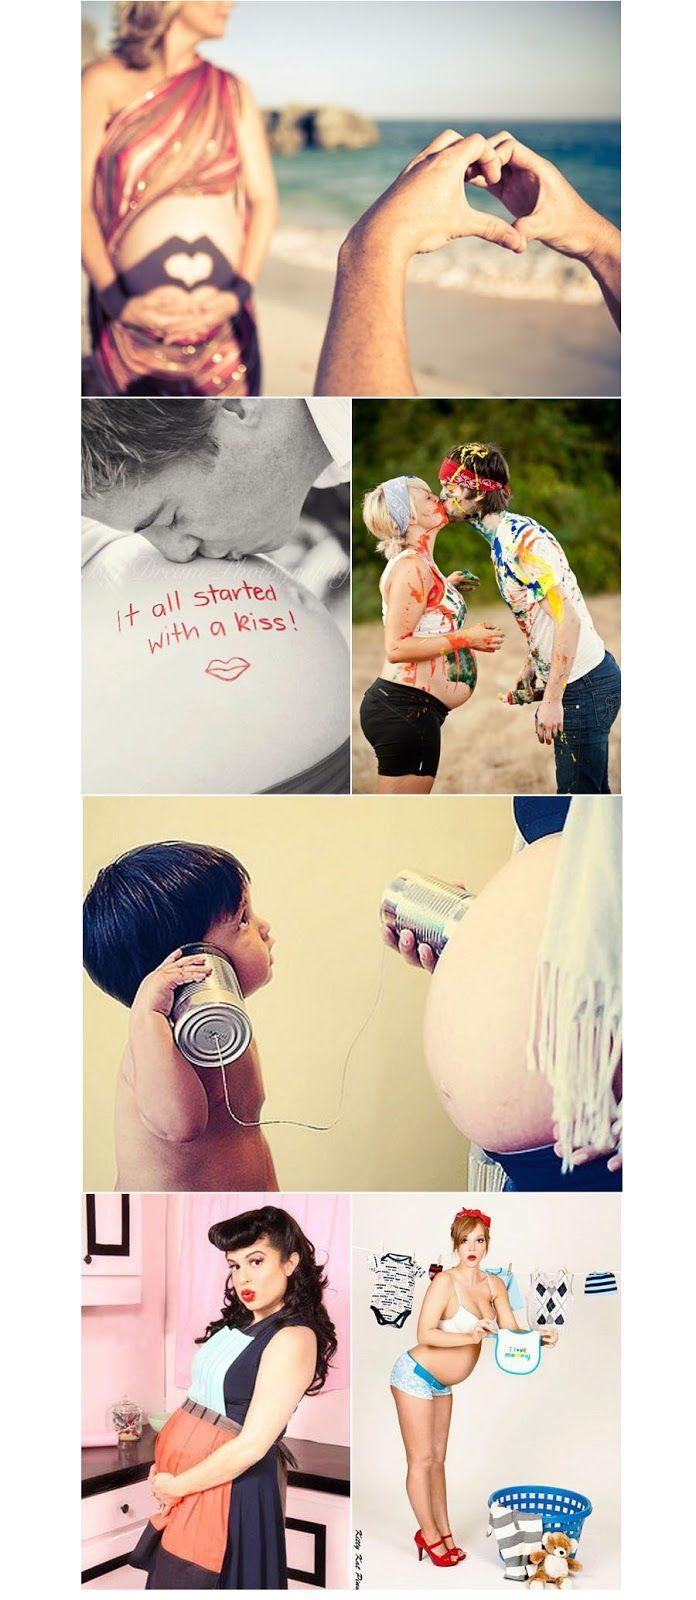 jill and the little crown: Five fun & unique #maternity photo session ideas!